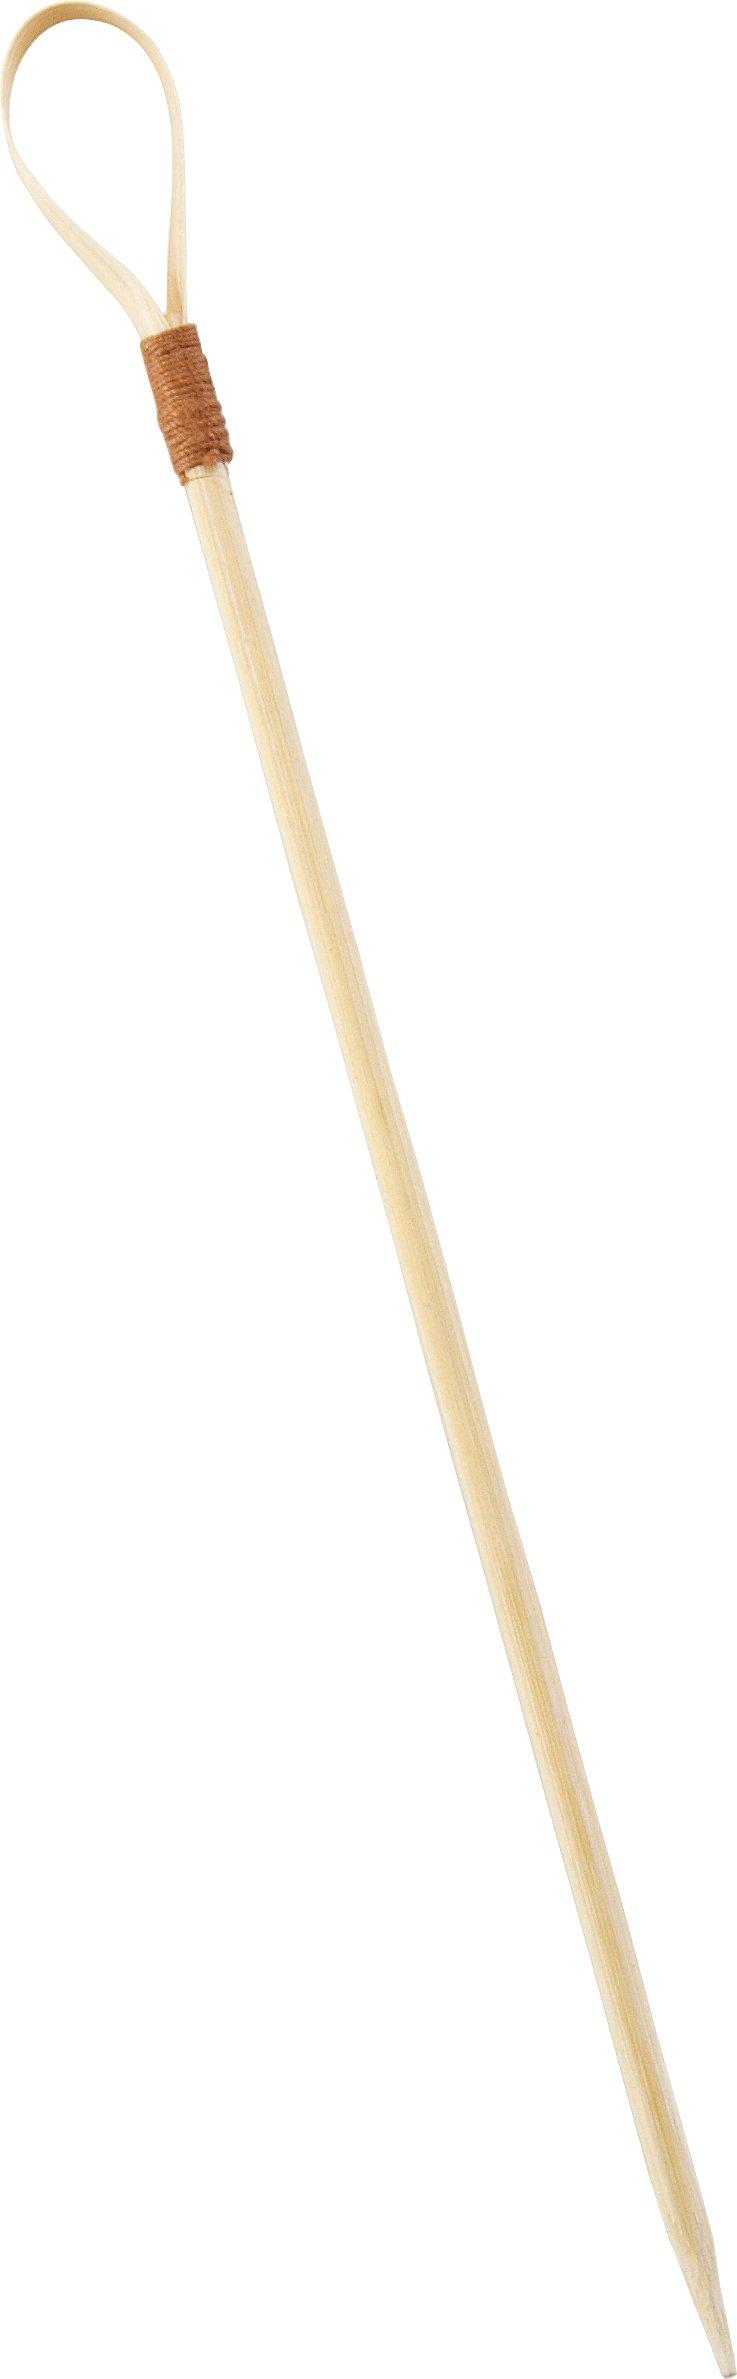 Solia VO11210 Bamboo Pique Image Skewer, 0.1'' Diameter x 3.93'' Height (Case of 2000)